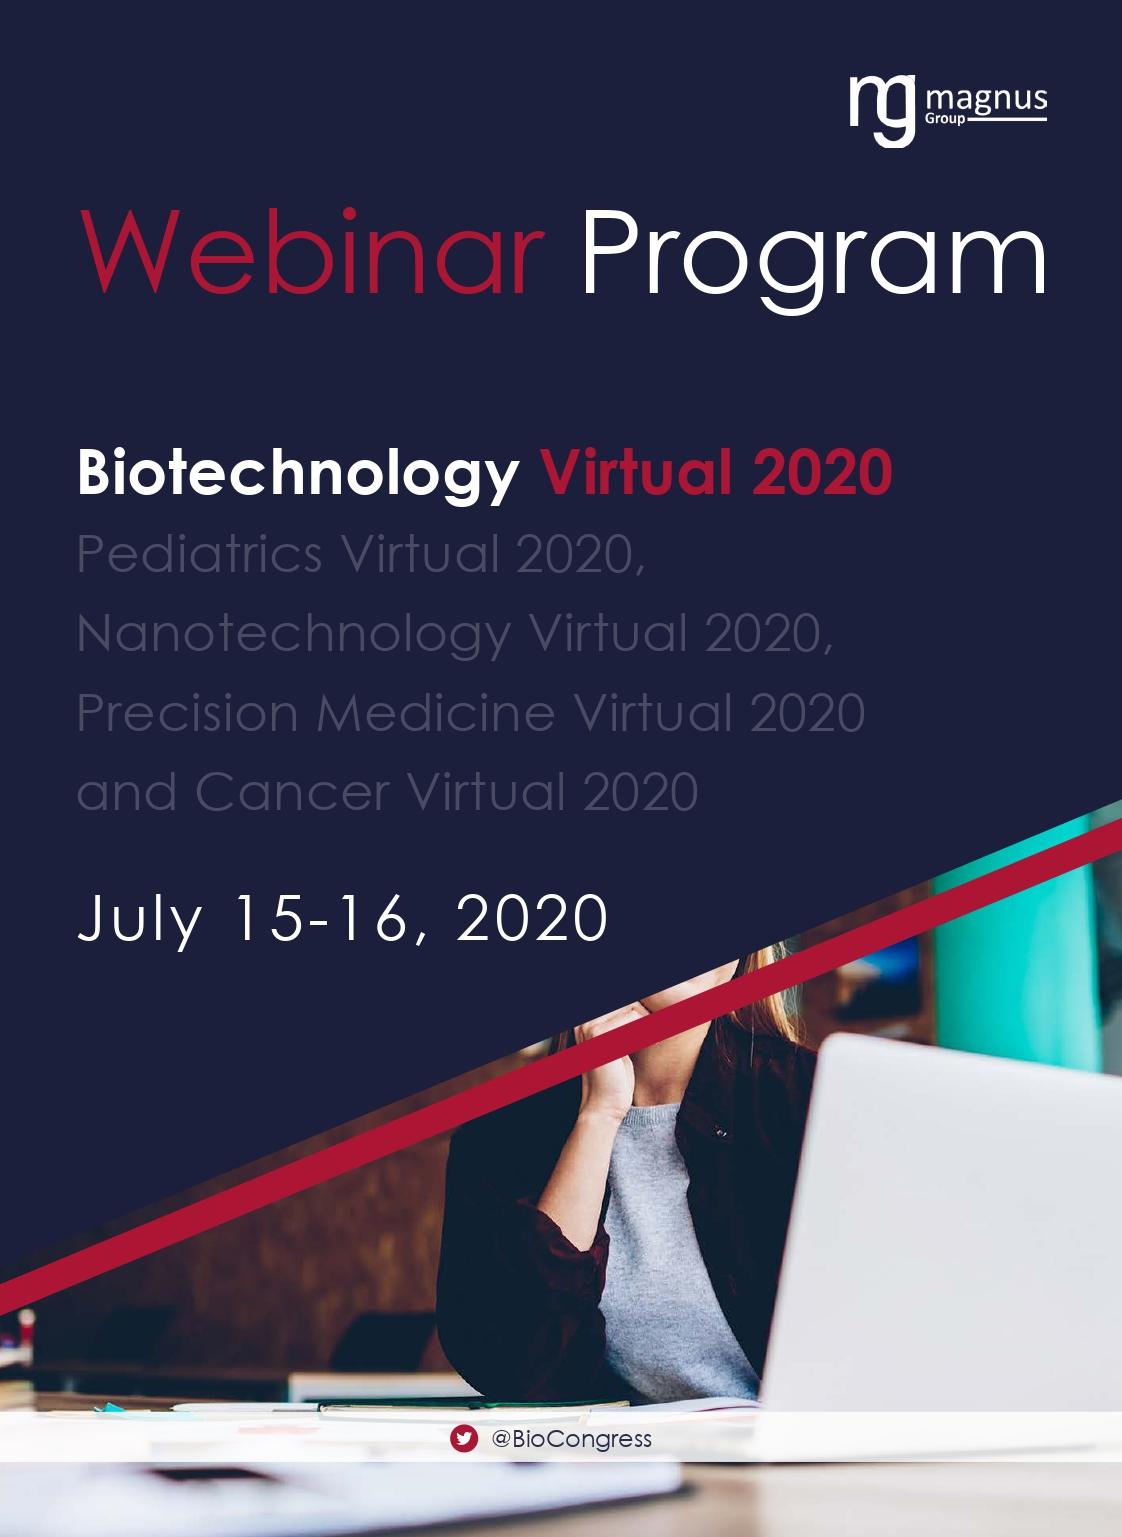 1st Edition of International Webinar on Biotechnology and Bioenginering | Online Event Program